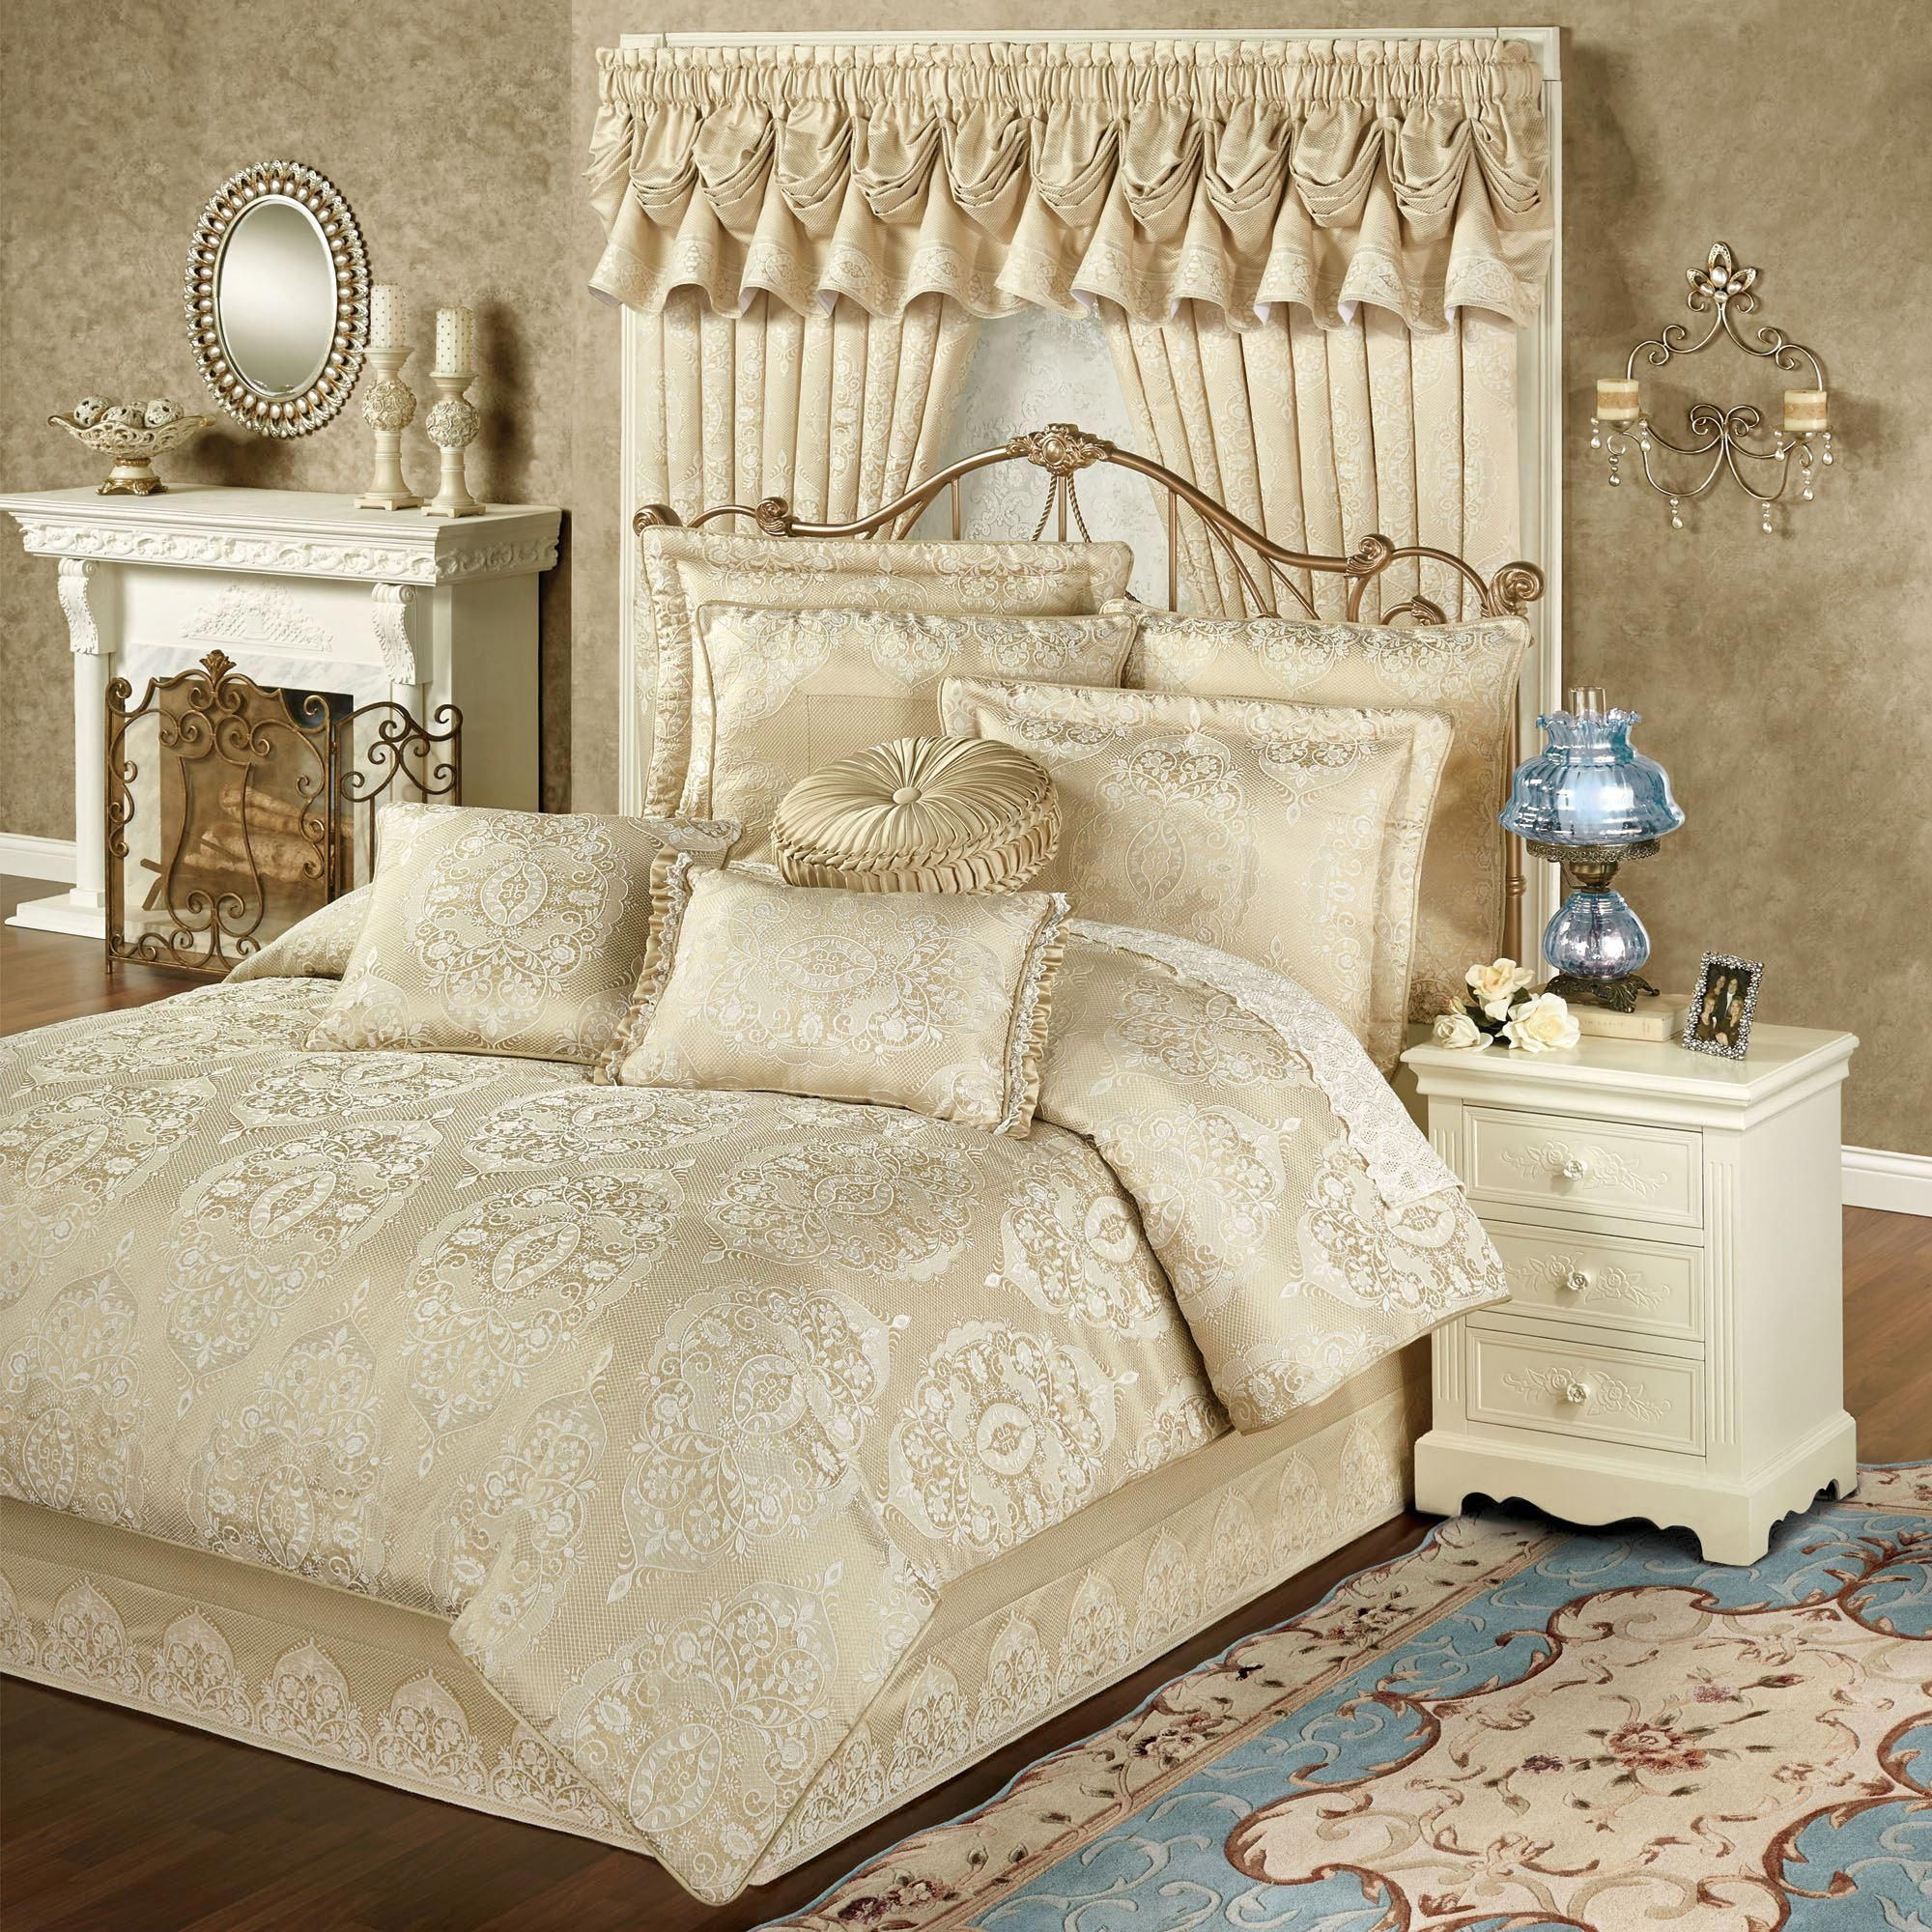 Francesca light gold comforter bedding in 2020 luxury